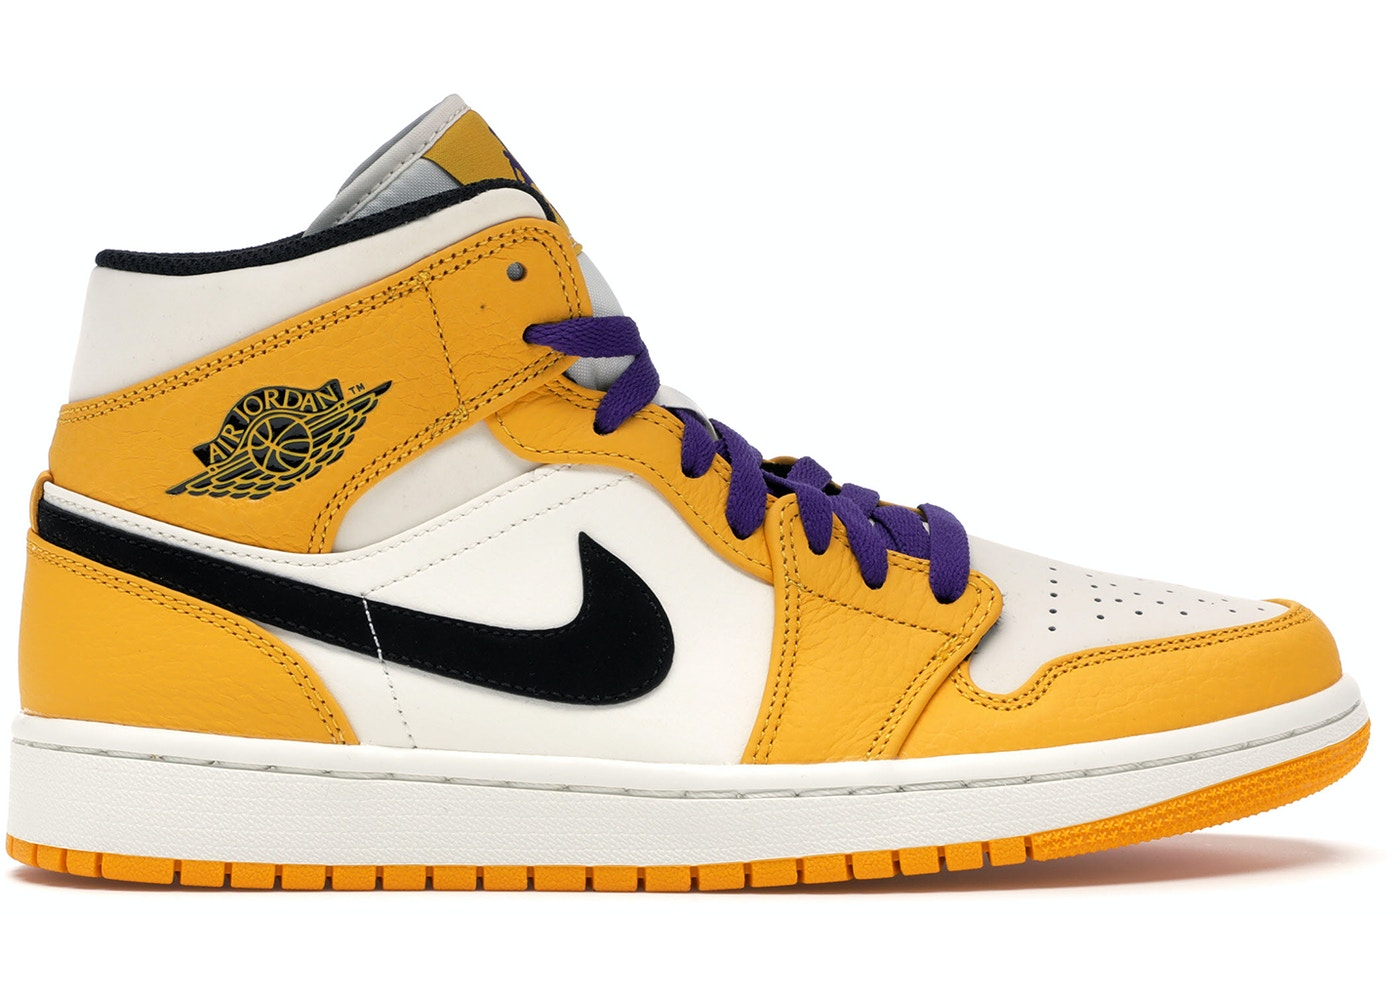 buy online c4c42 d8c22 Buy Air Jordan 1 Shoes   Deadstock Sneakers